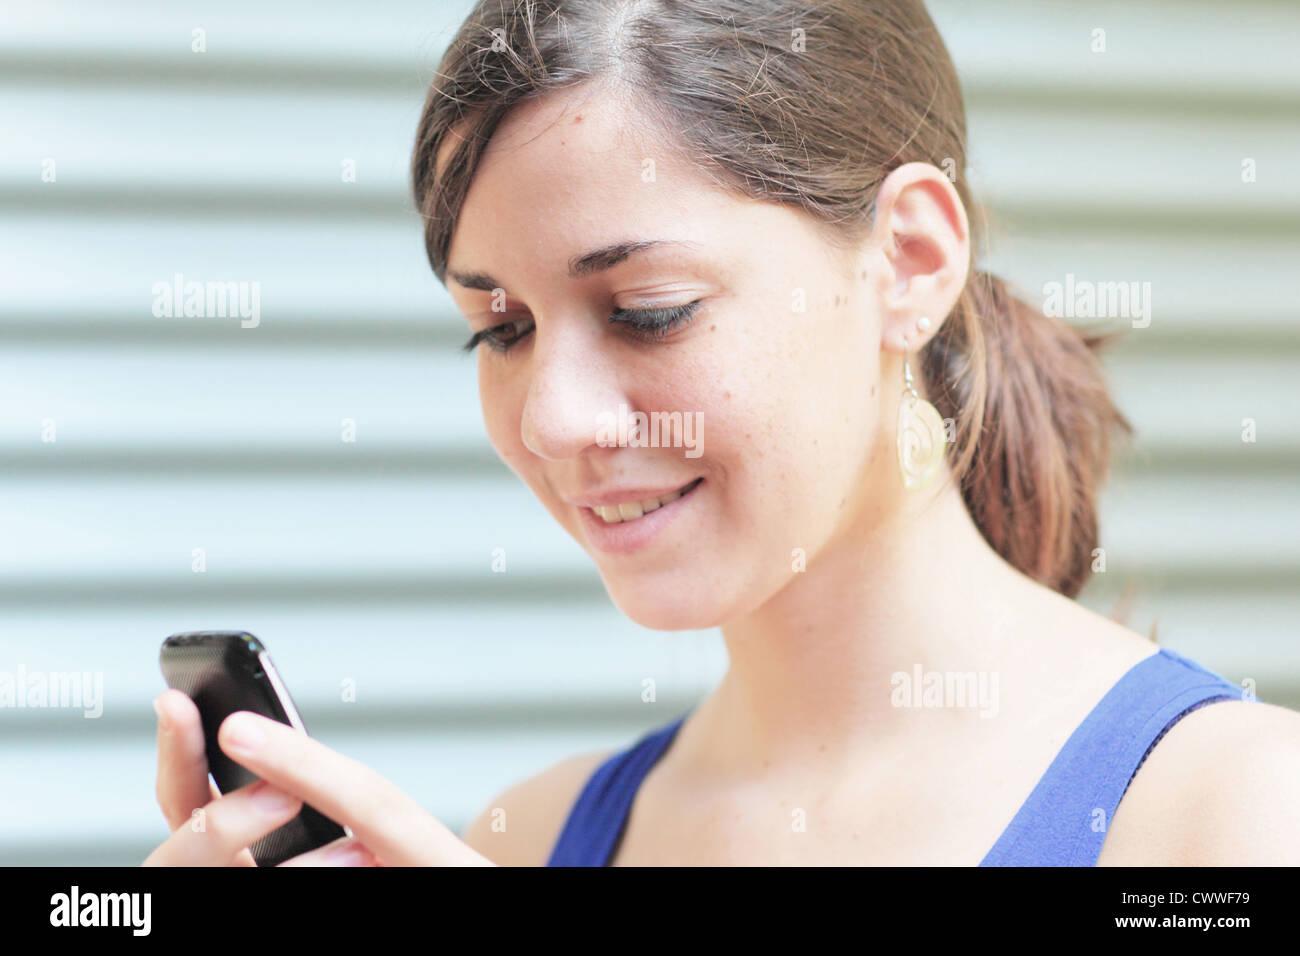 Teenager-Mädchen mit Handy Stockfoto